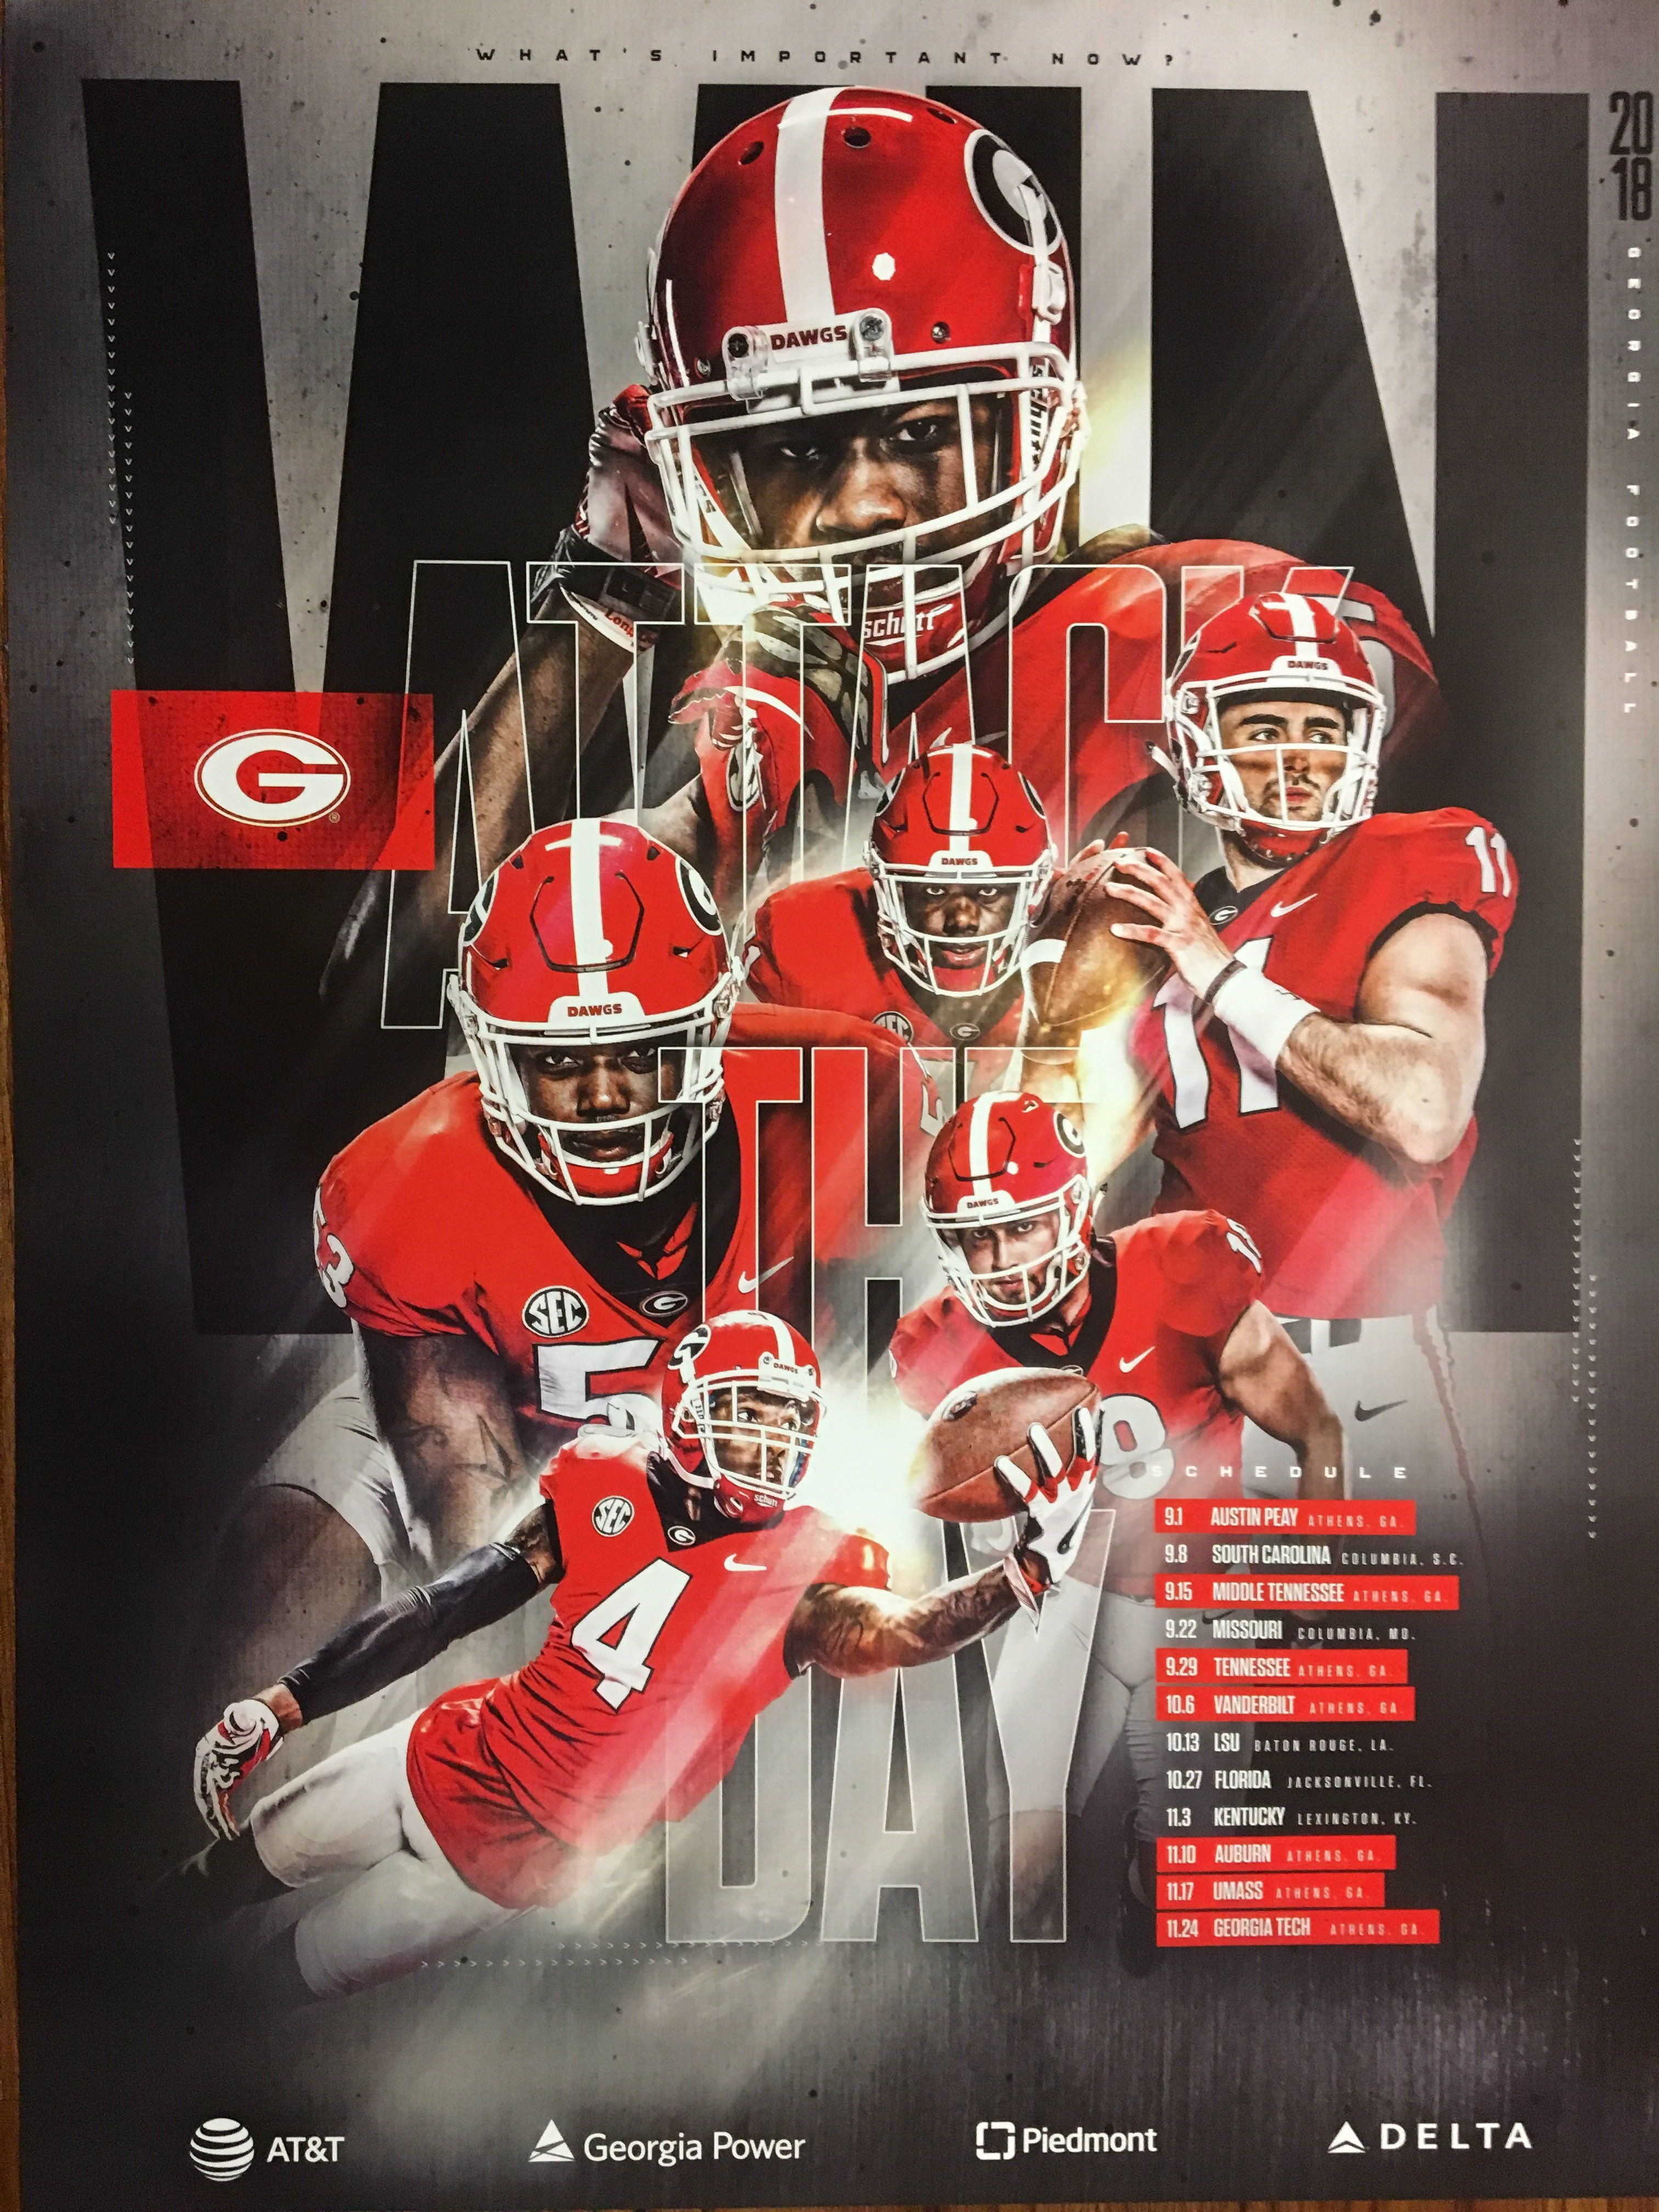 2018 Football Team Schedule Poster Football Poster Team Schedule Football Design